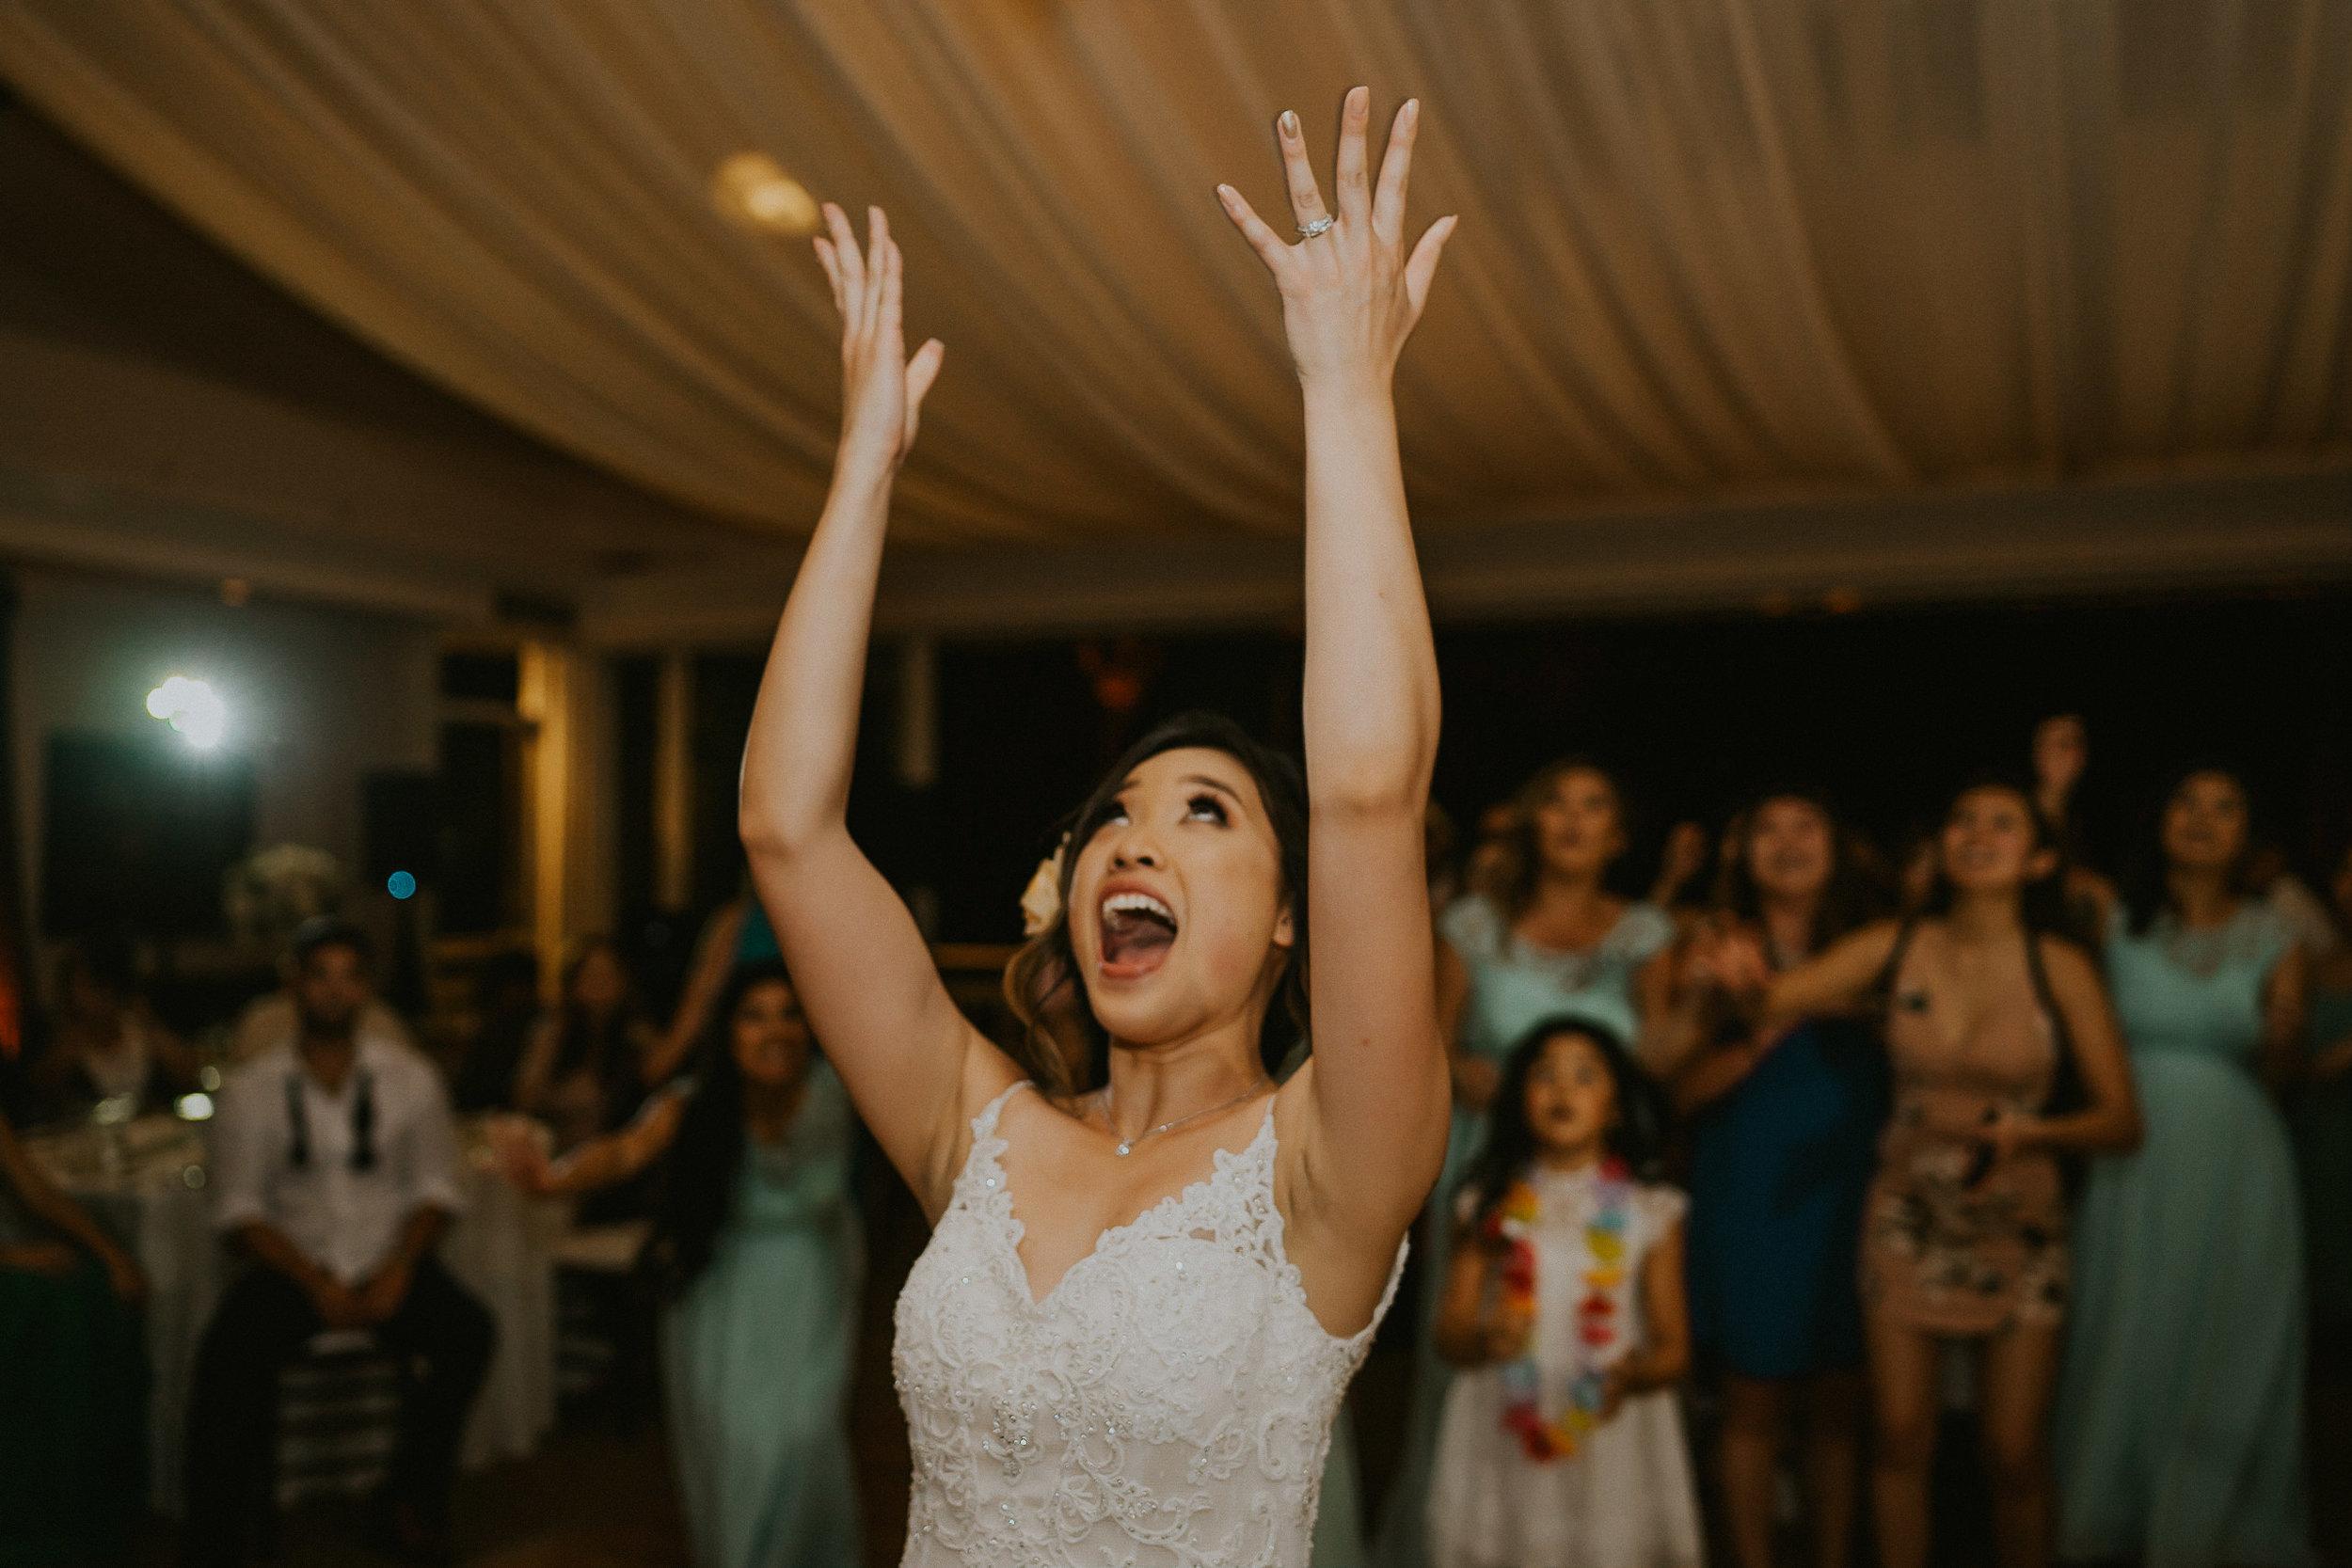 Maui_Destination_wedding_Alfred_Tang-102.jpg